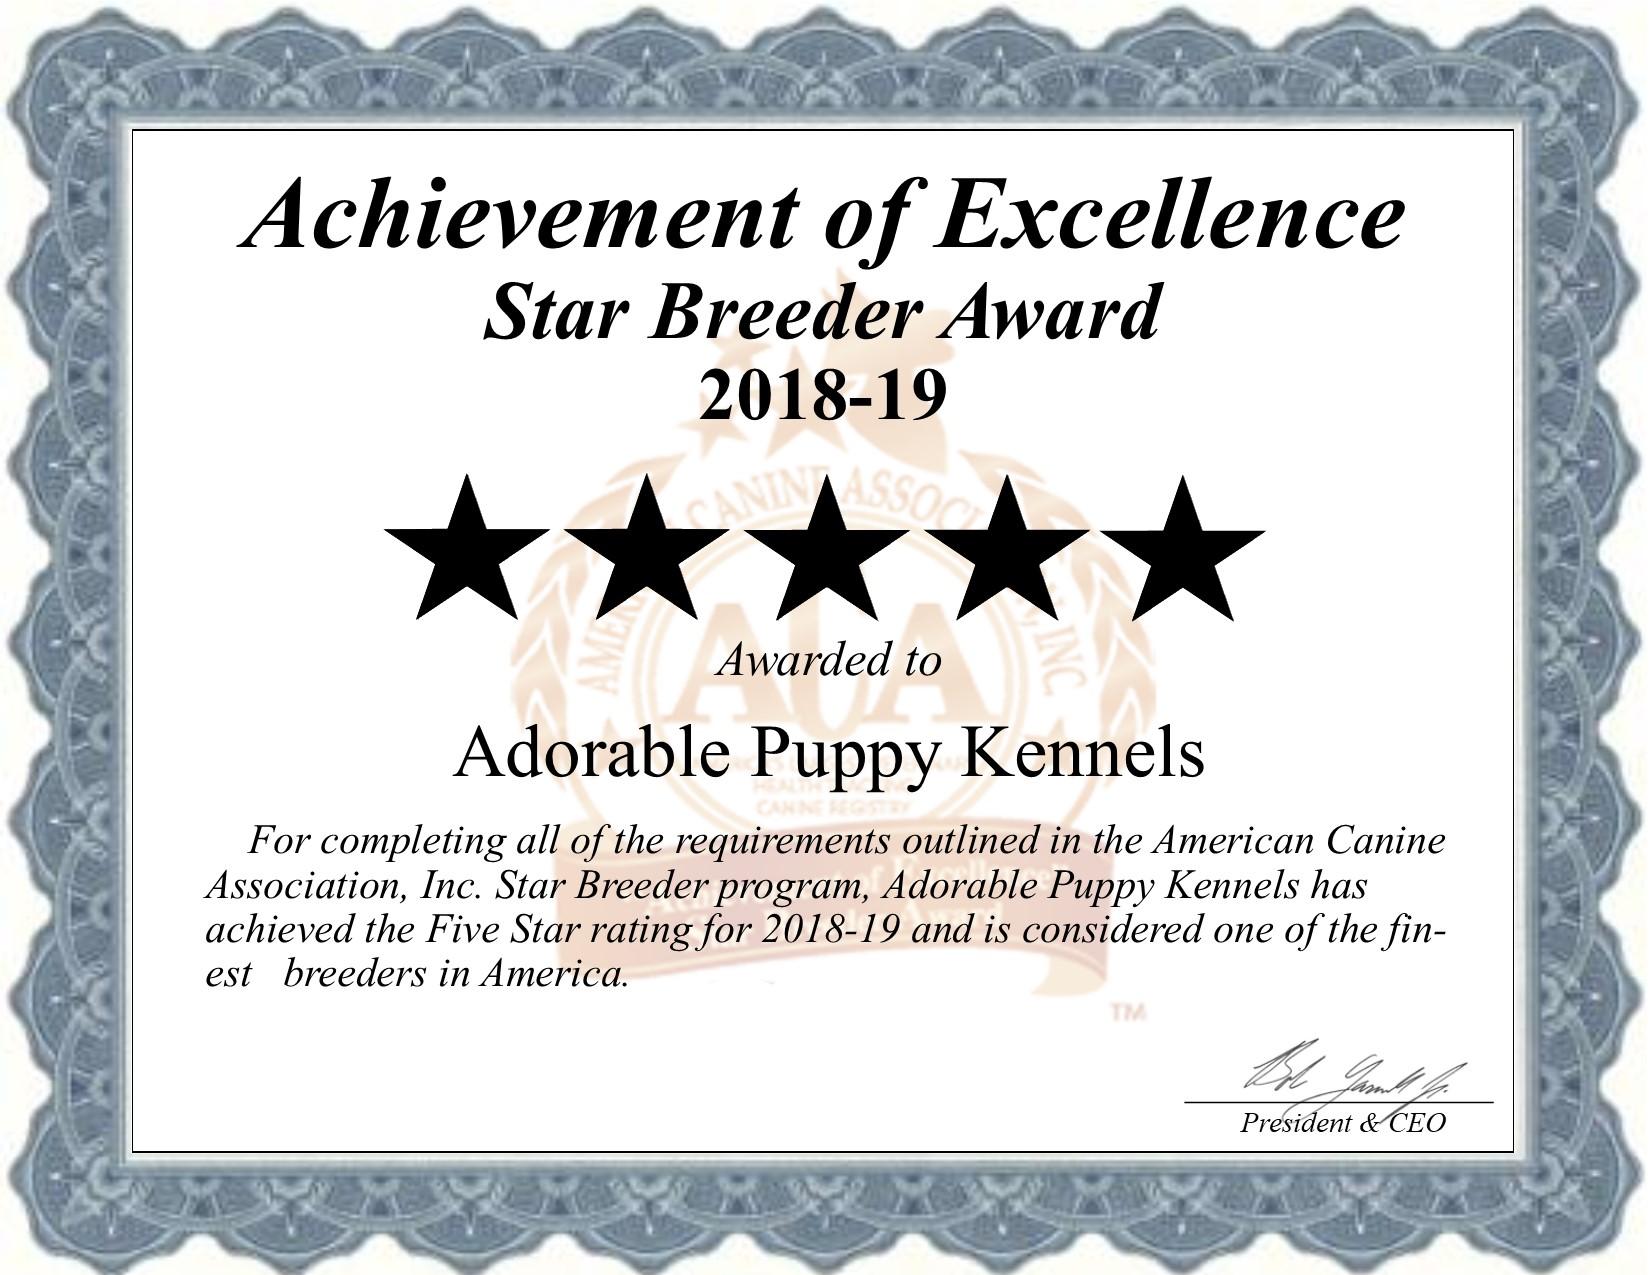 adorable, puppy, kennels, star, breeder, certificate, adorable-puppy, dog-breeder, kennel, reviews, customer, star, star-breeder, 5, five, USDA, rock, valley, ia, iowa  puppy, puppies, ACA, inspection, inspections, reports, mill, puppymill, mills;